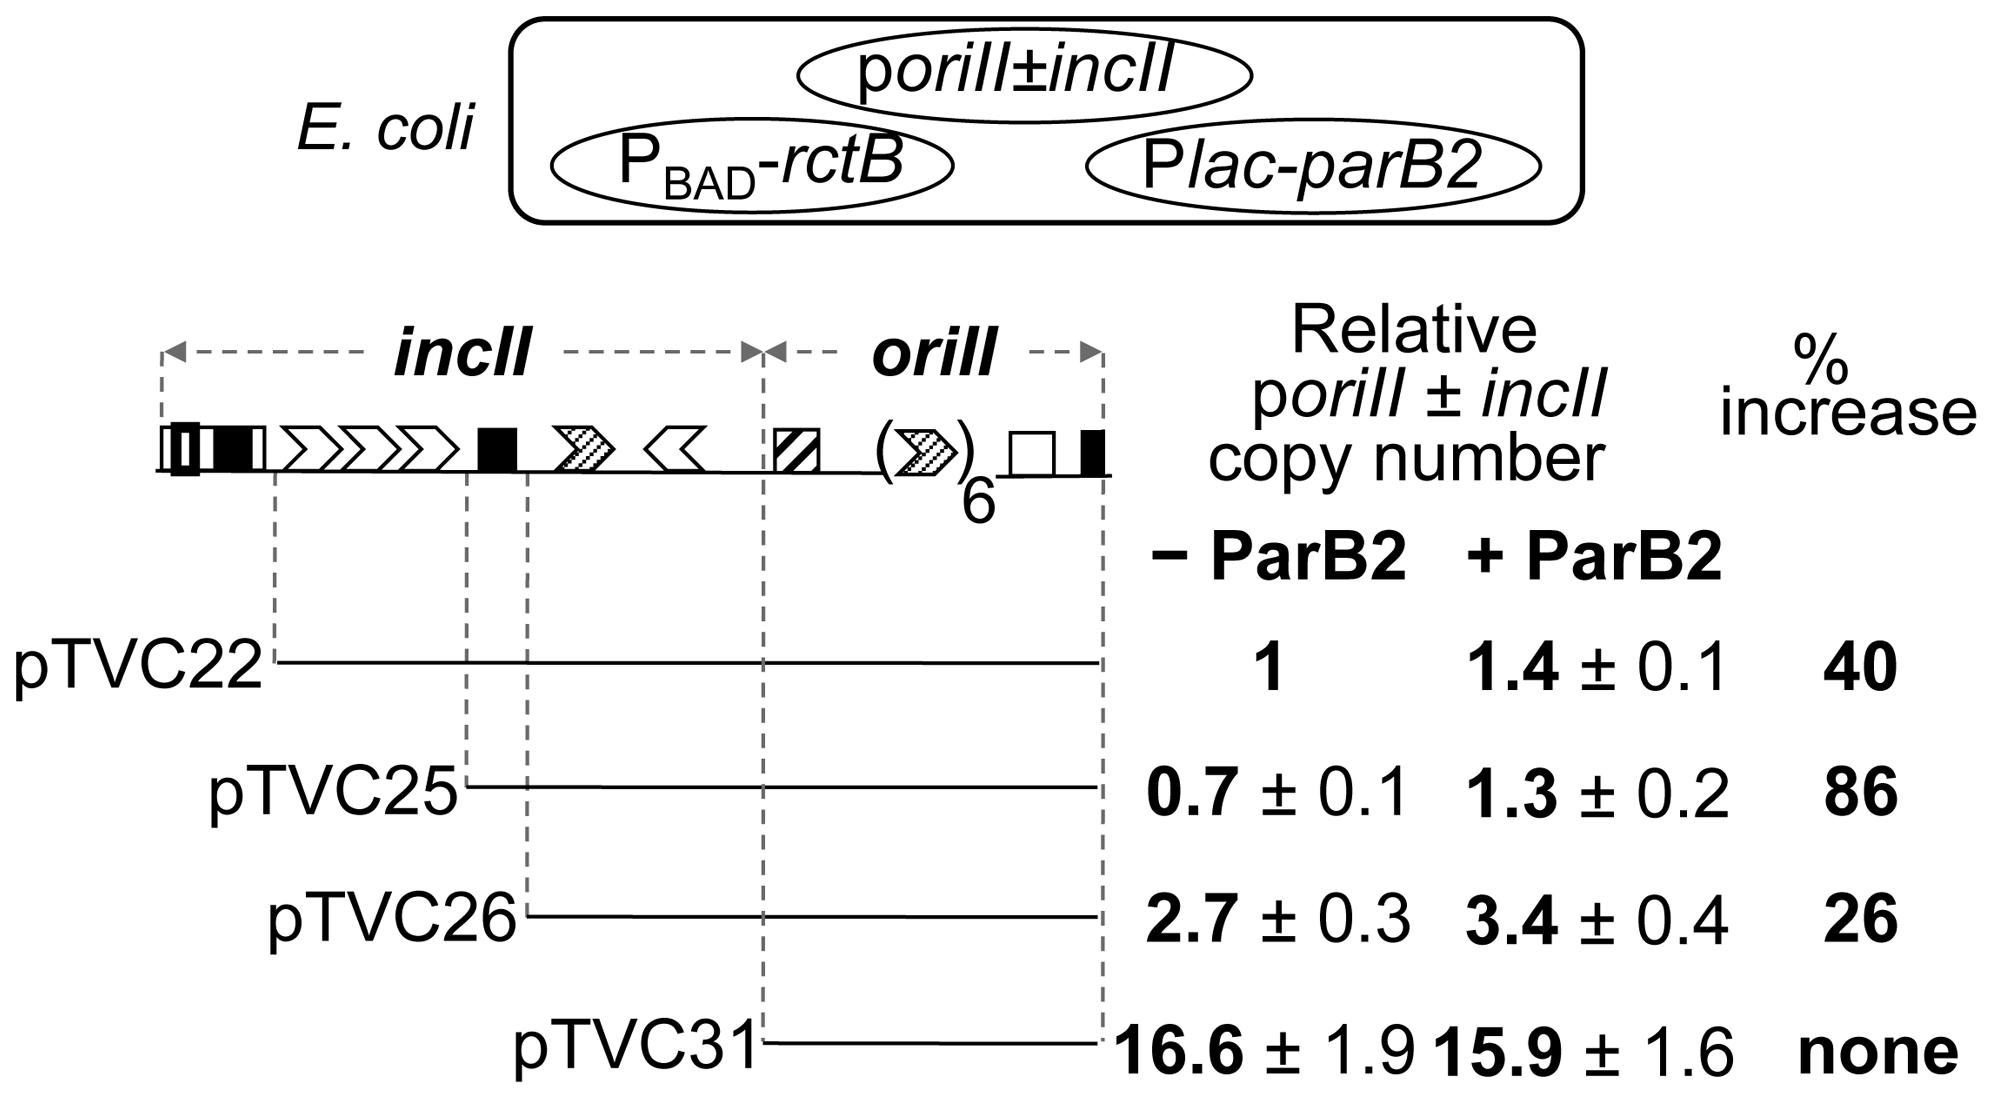 Increase in copy number of <i>oriII</i> plasmids by ParB2 in the absence of <i>parS2-B</i> in <i>E. coli</i>.